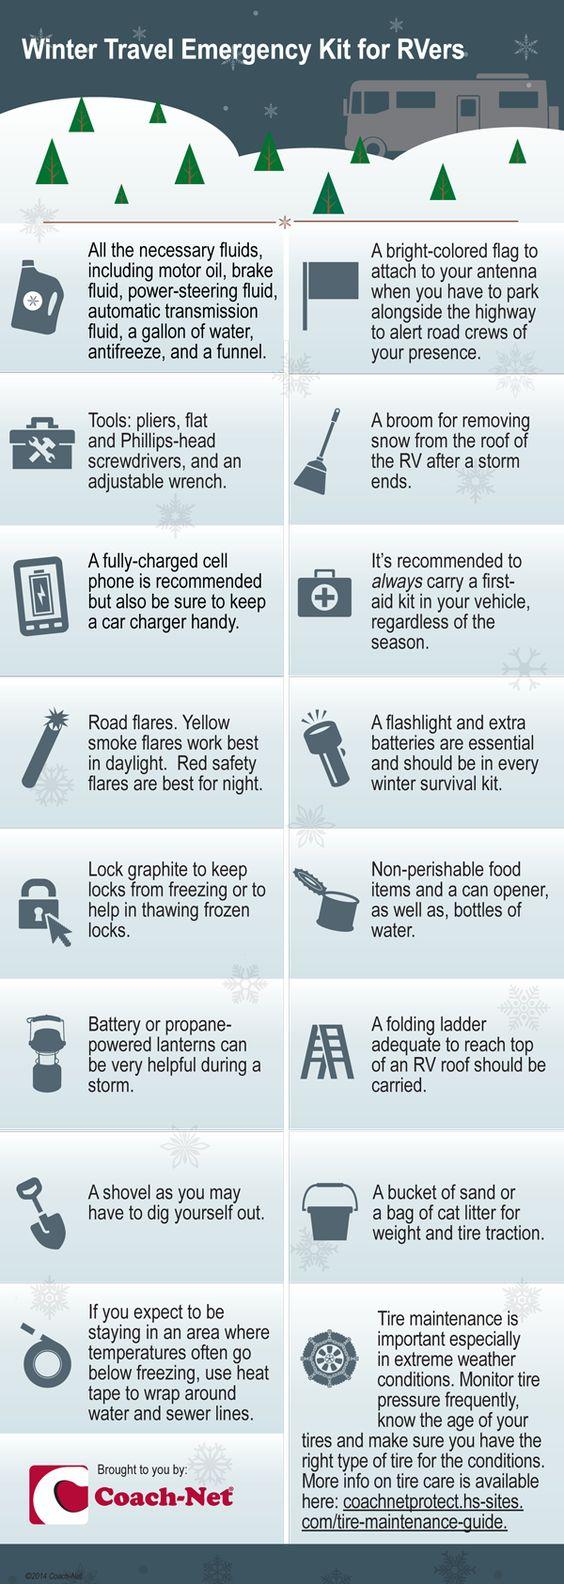 Winter Emergency RV kit